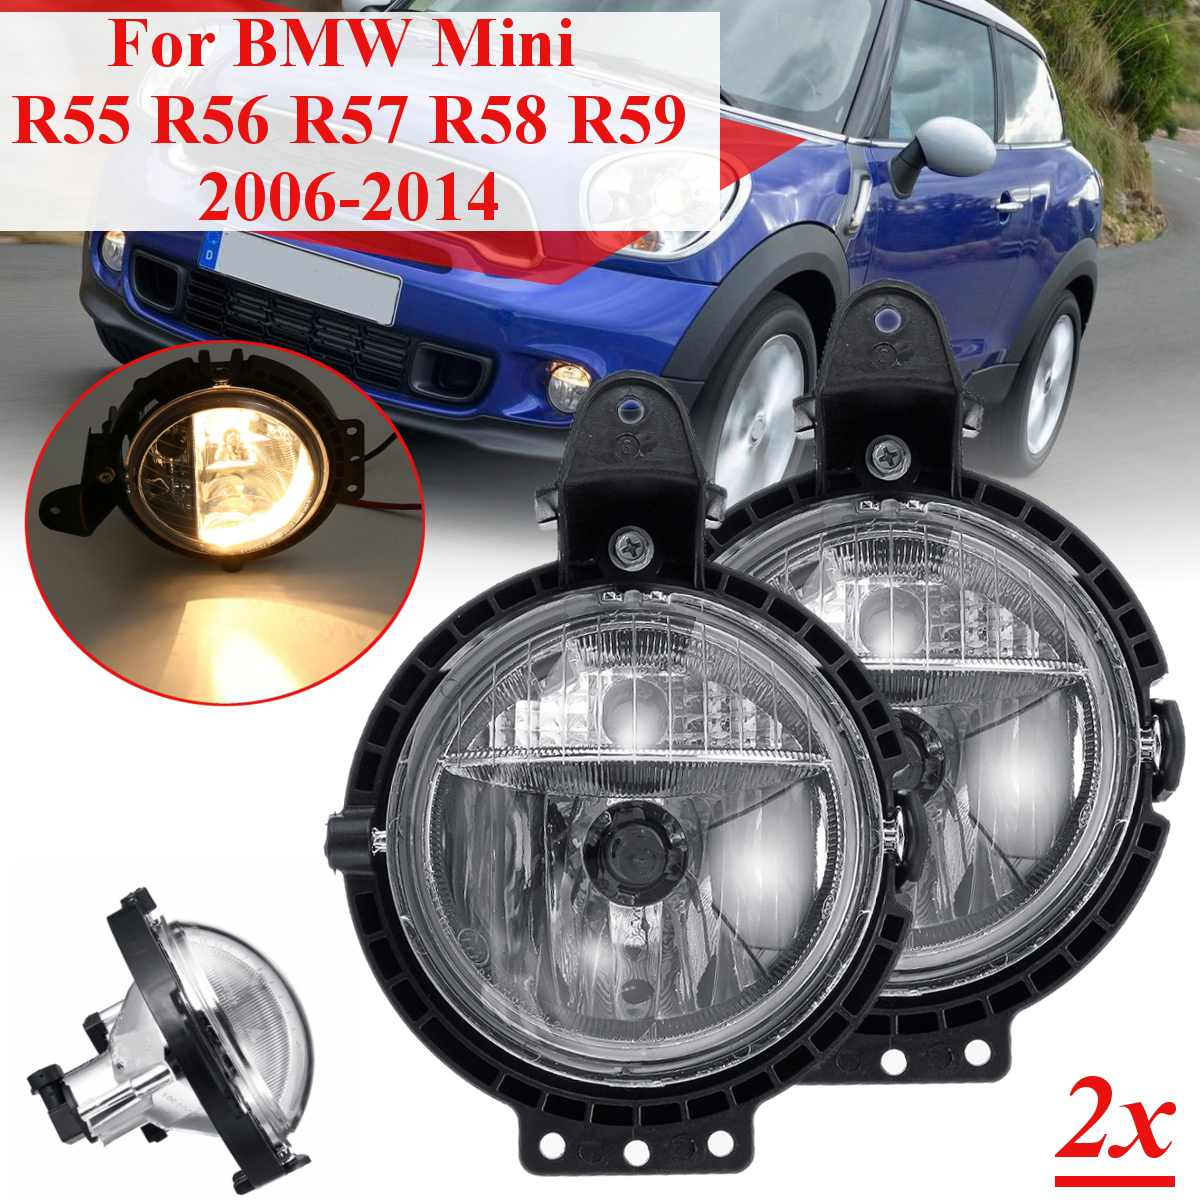 2pcs Car Fog Light For BMW Mini R55 R56 R57 R58 R59 Clubvan Clubman Cooper Roadster Countryman one Lamp With Bulb Driving Lamp